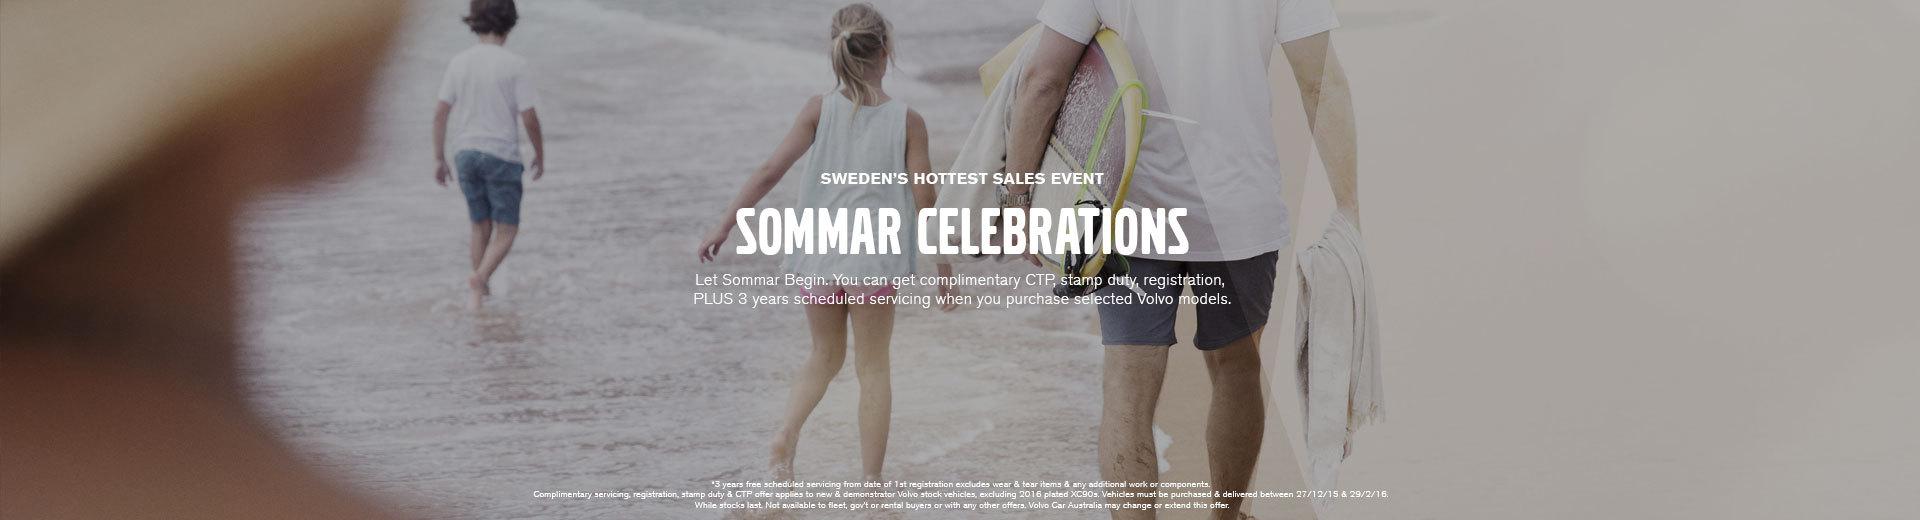 Sommar Celebrations